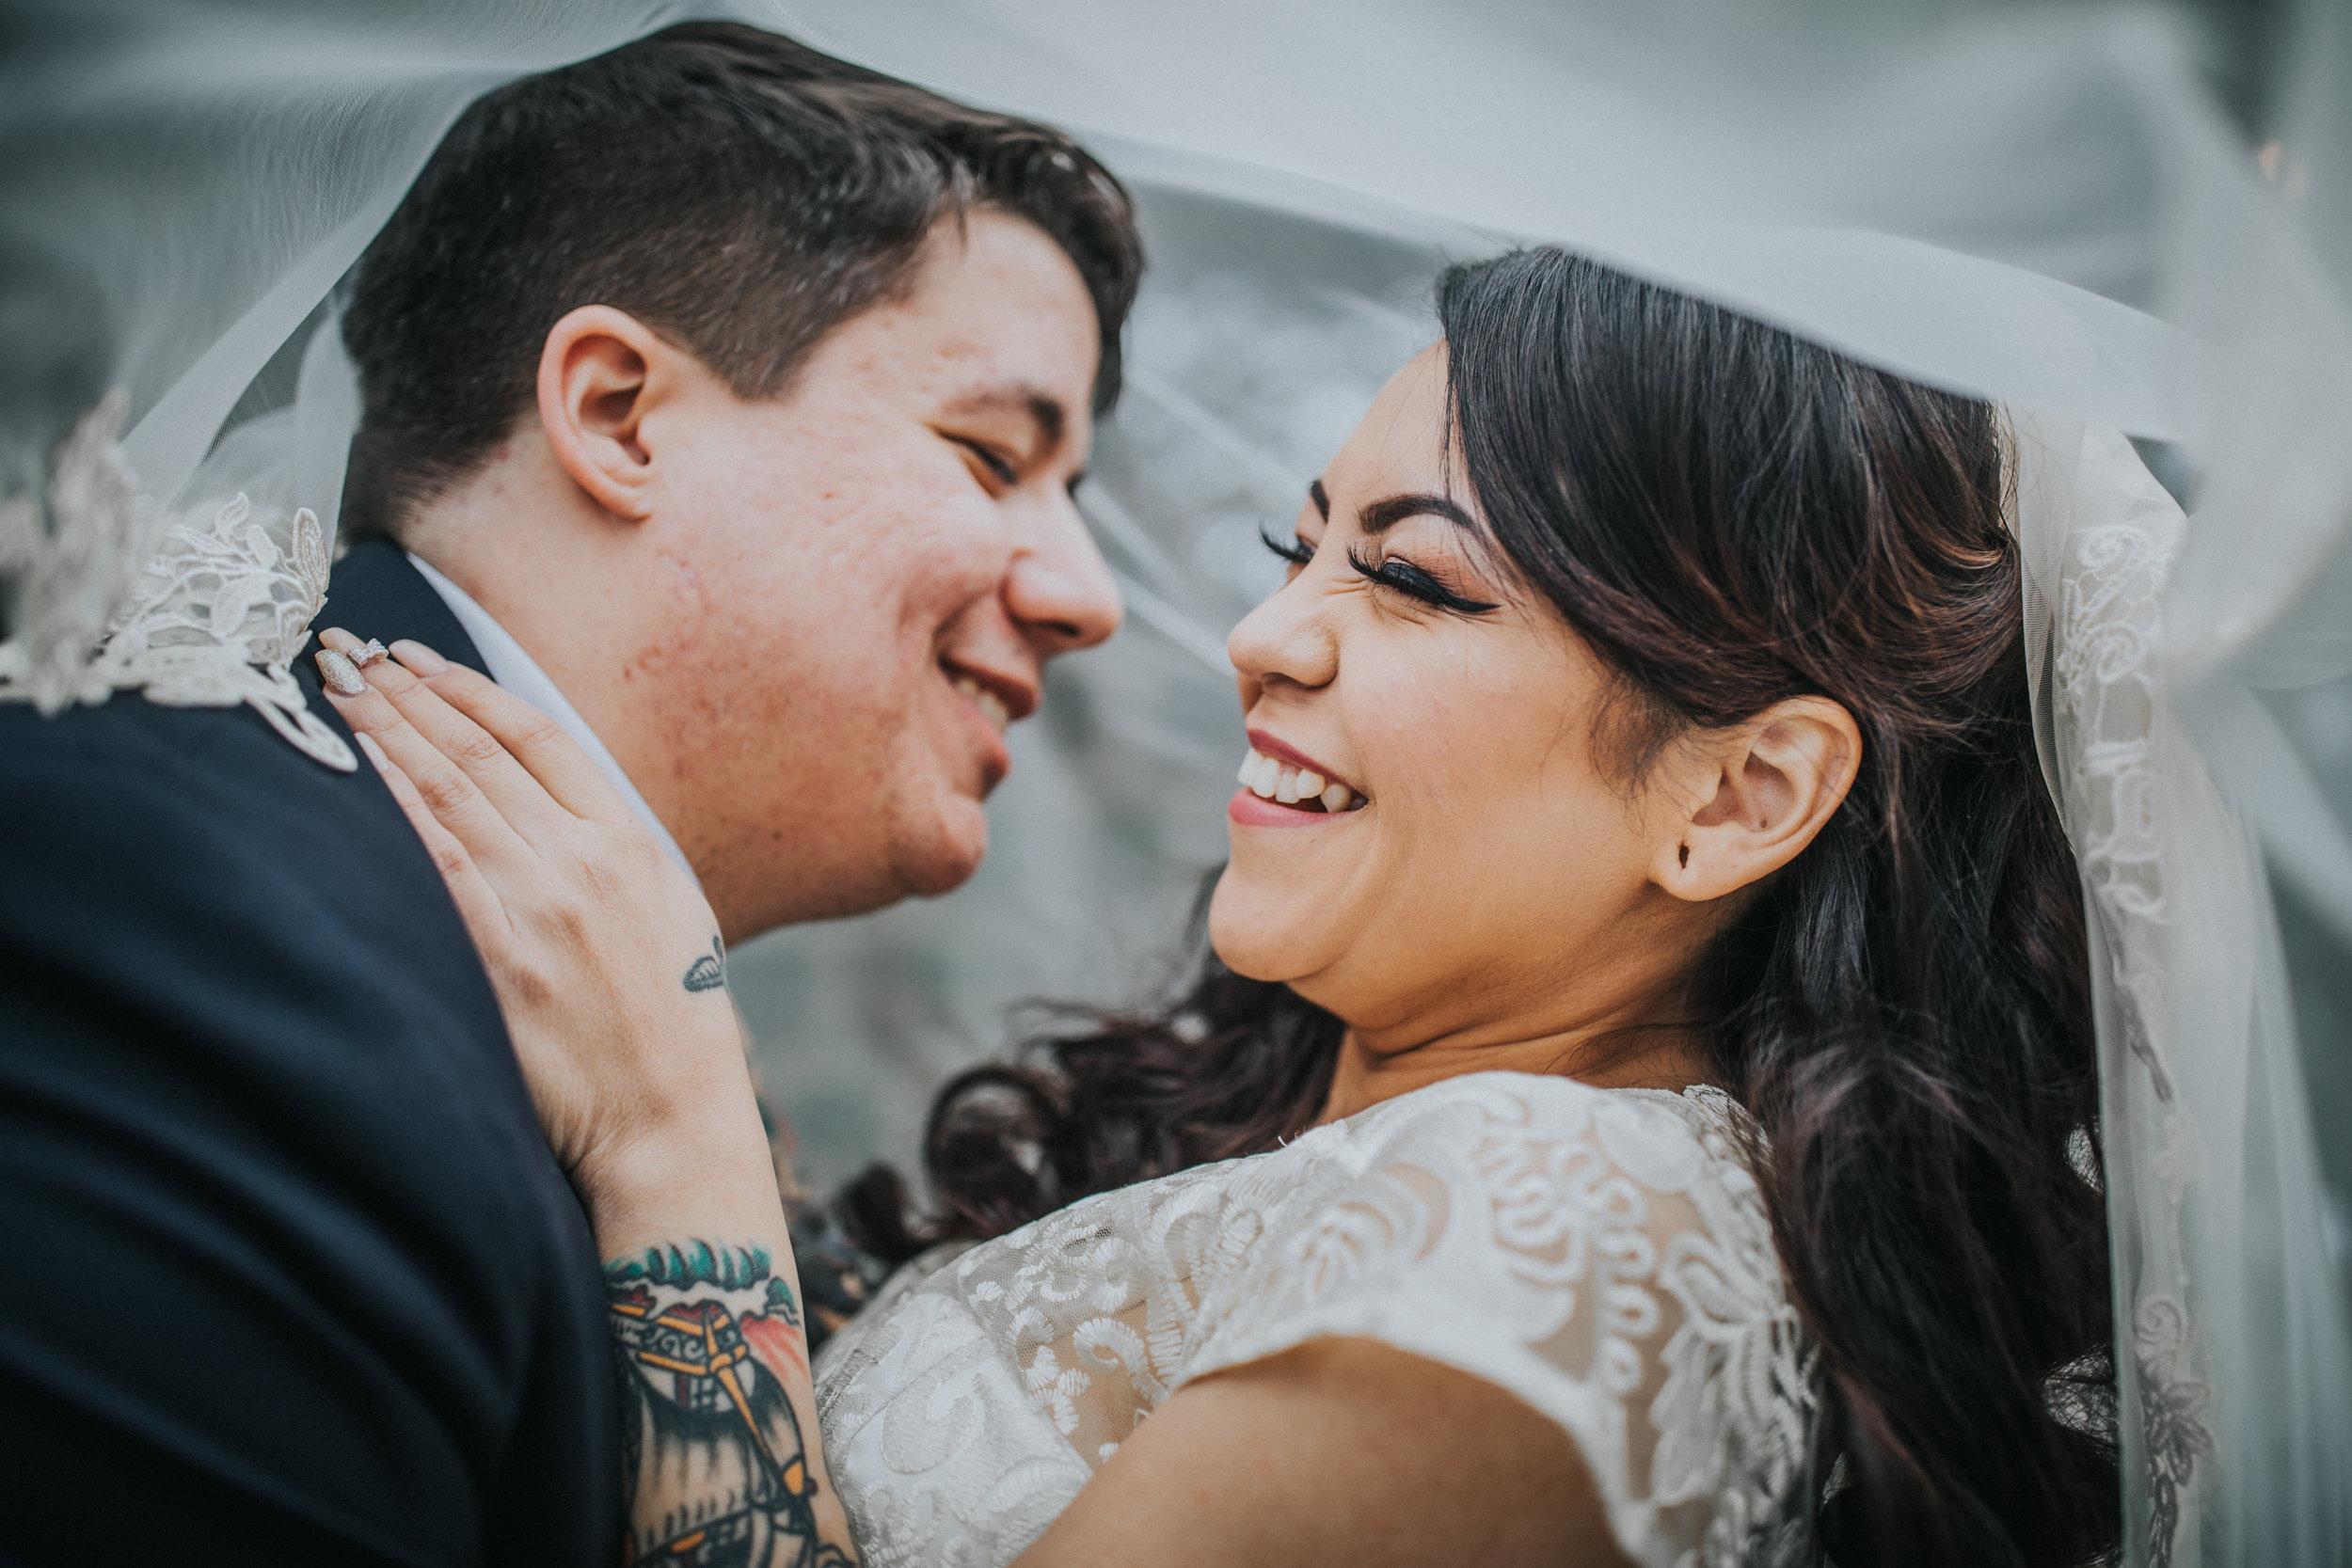 New-Jersey-Wedding-Photographer-ReceptionCenter-Valeria&Mike-First-Look-Bride&Groom (75 of 7).jpg